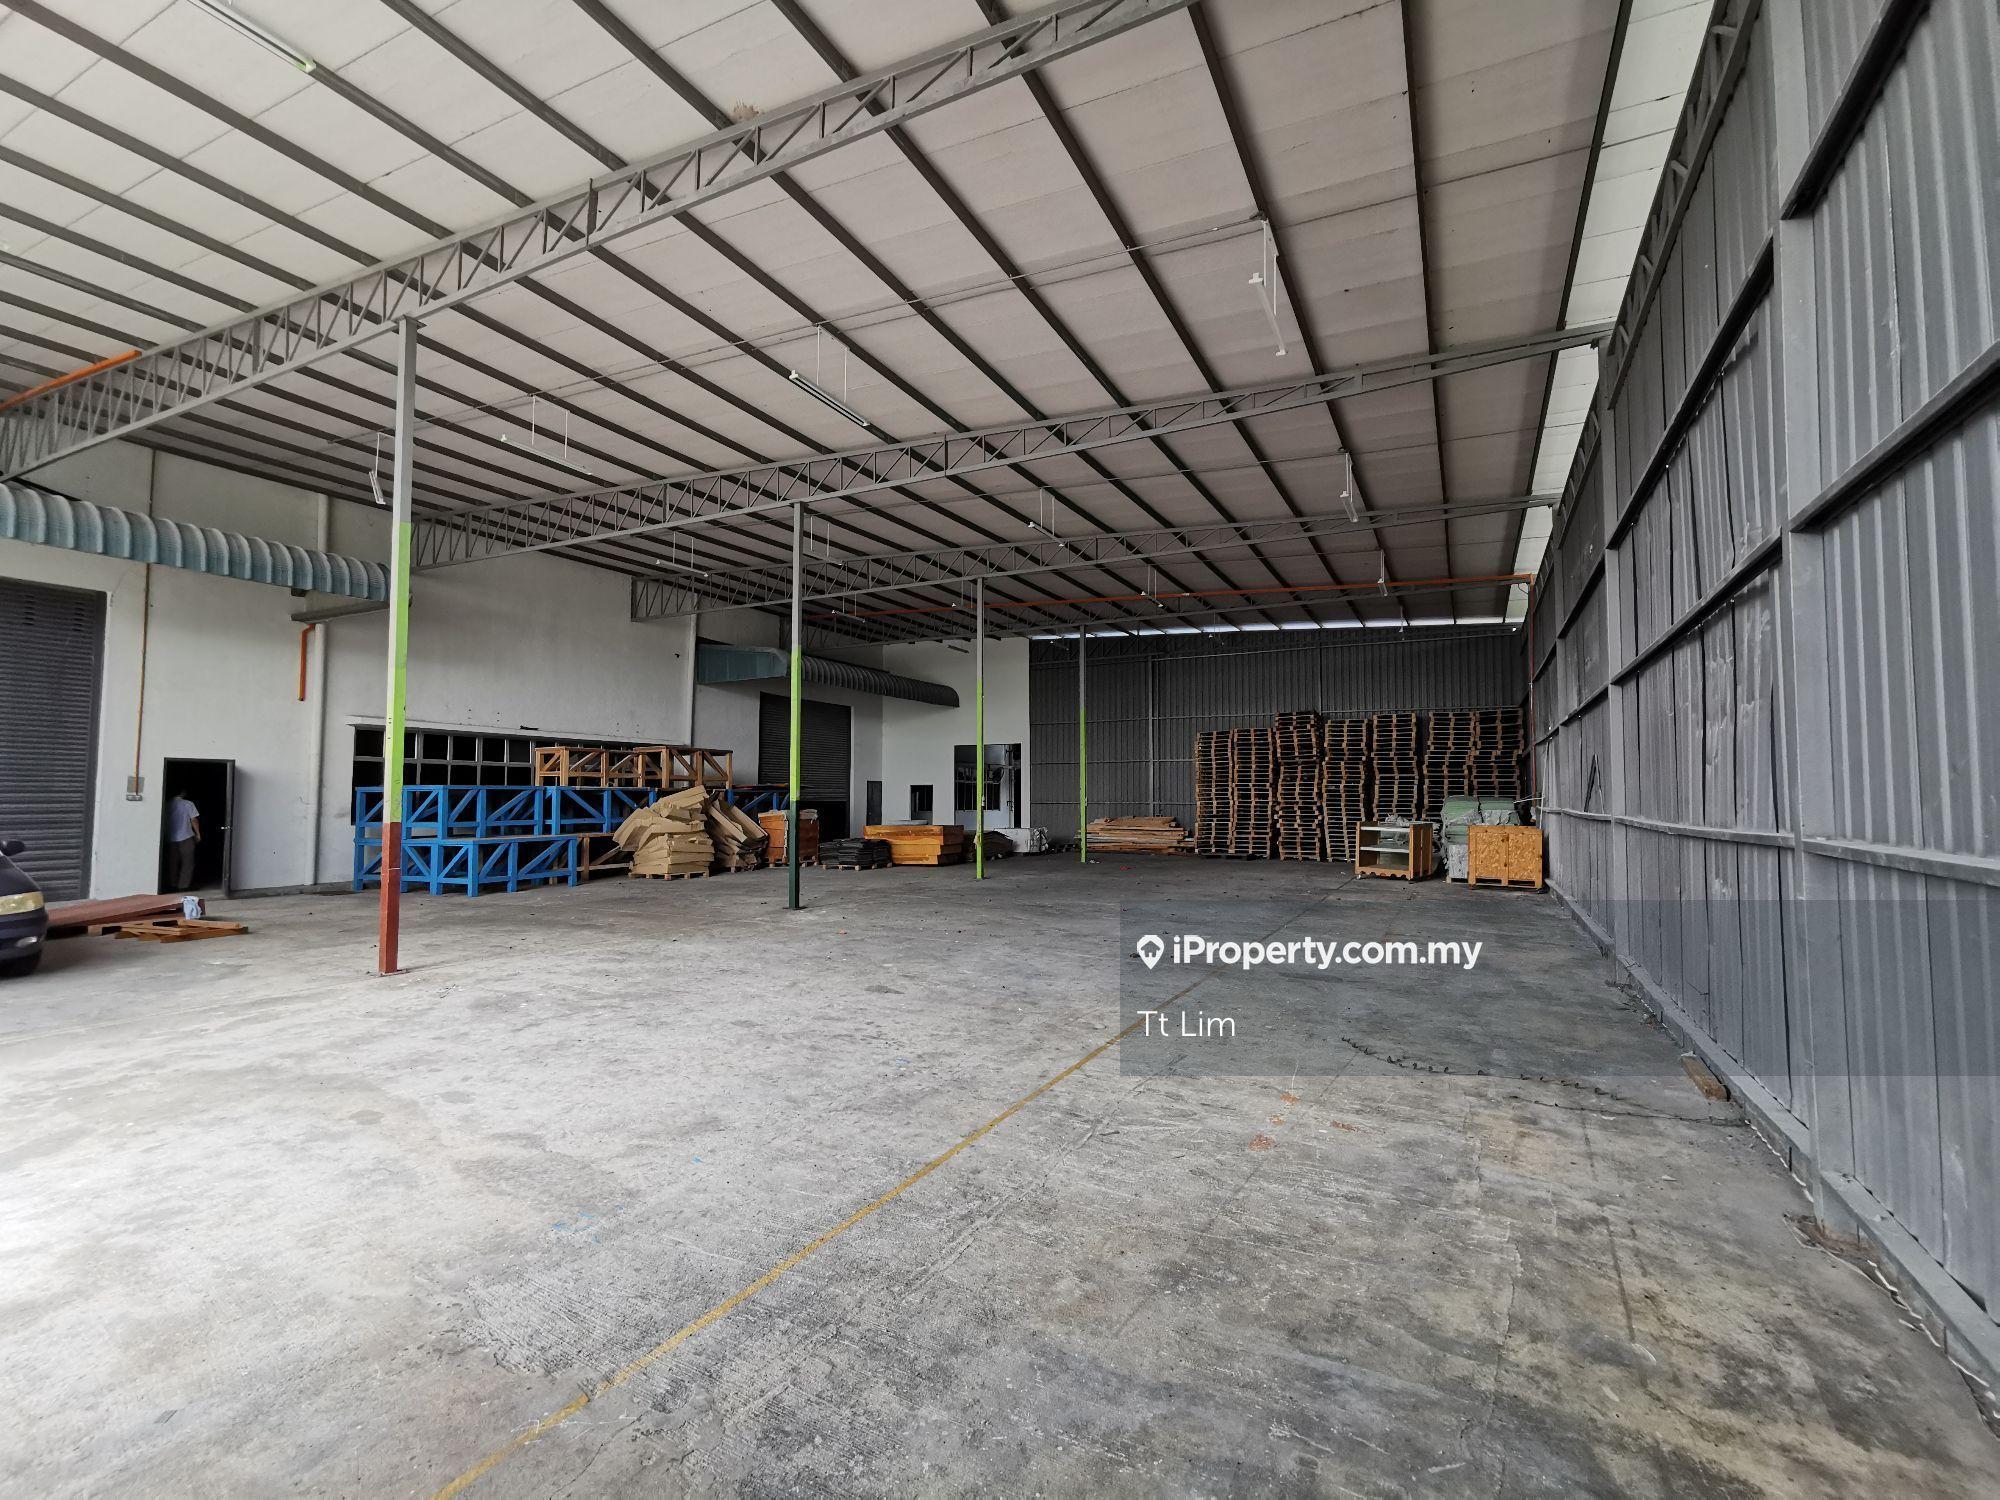 Nusa Cemerlang Industrial Park (SG via 2nd link) , Iskandar Puteri (Nusajaya)